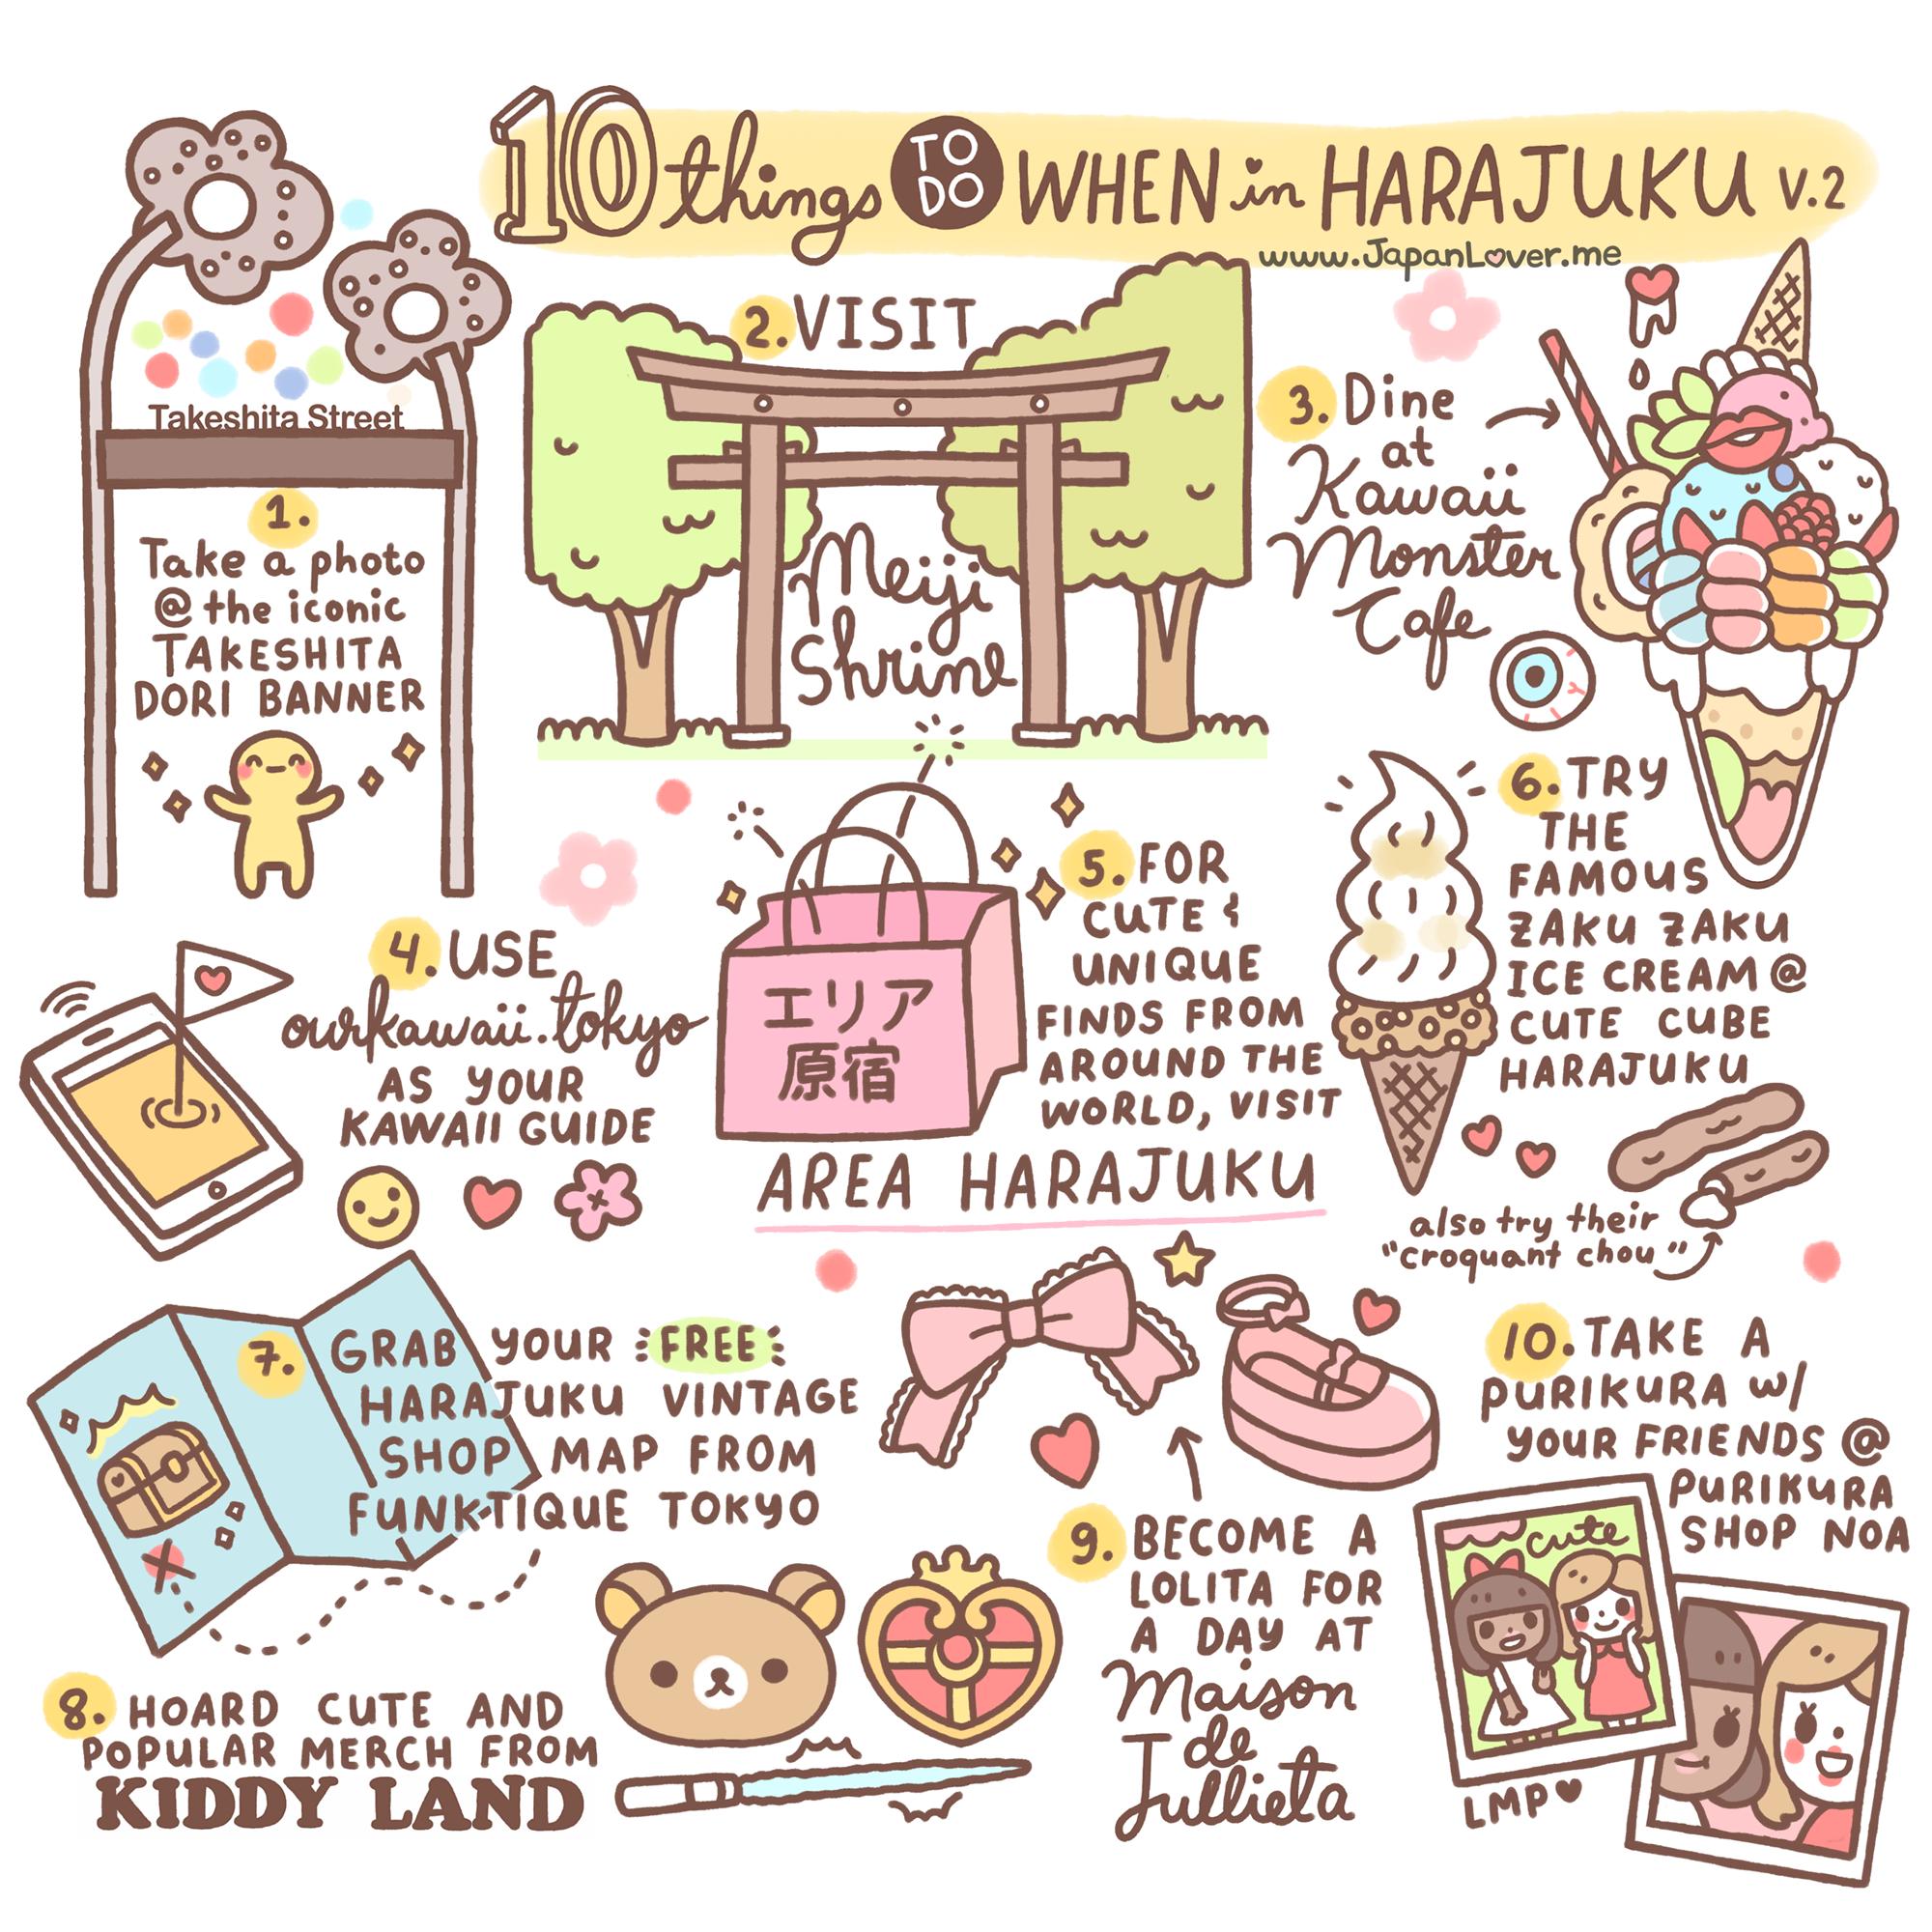 Tokyo clipart Tokyo Attractions Our dori do Kawaii things